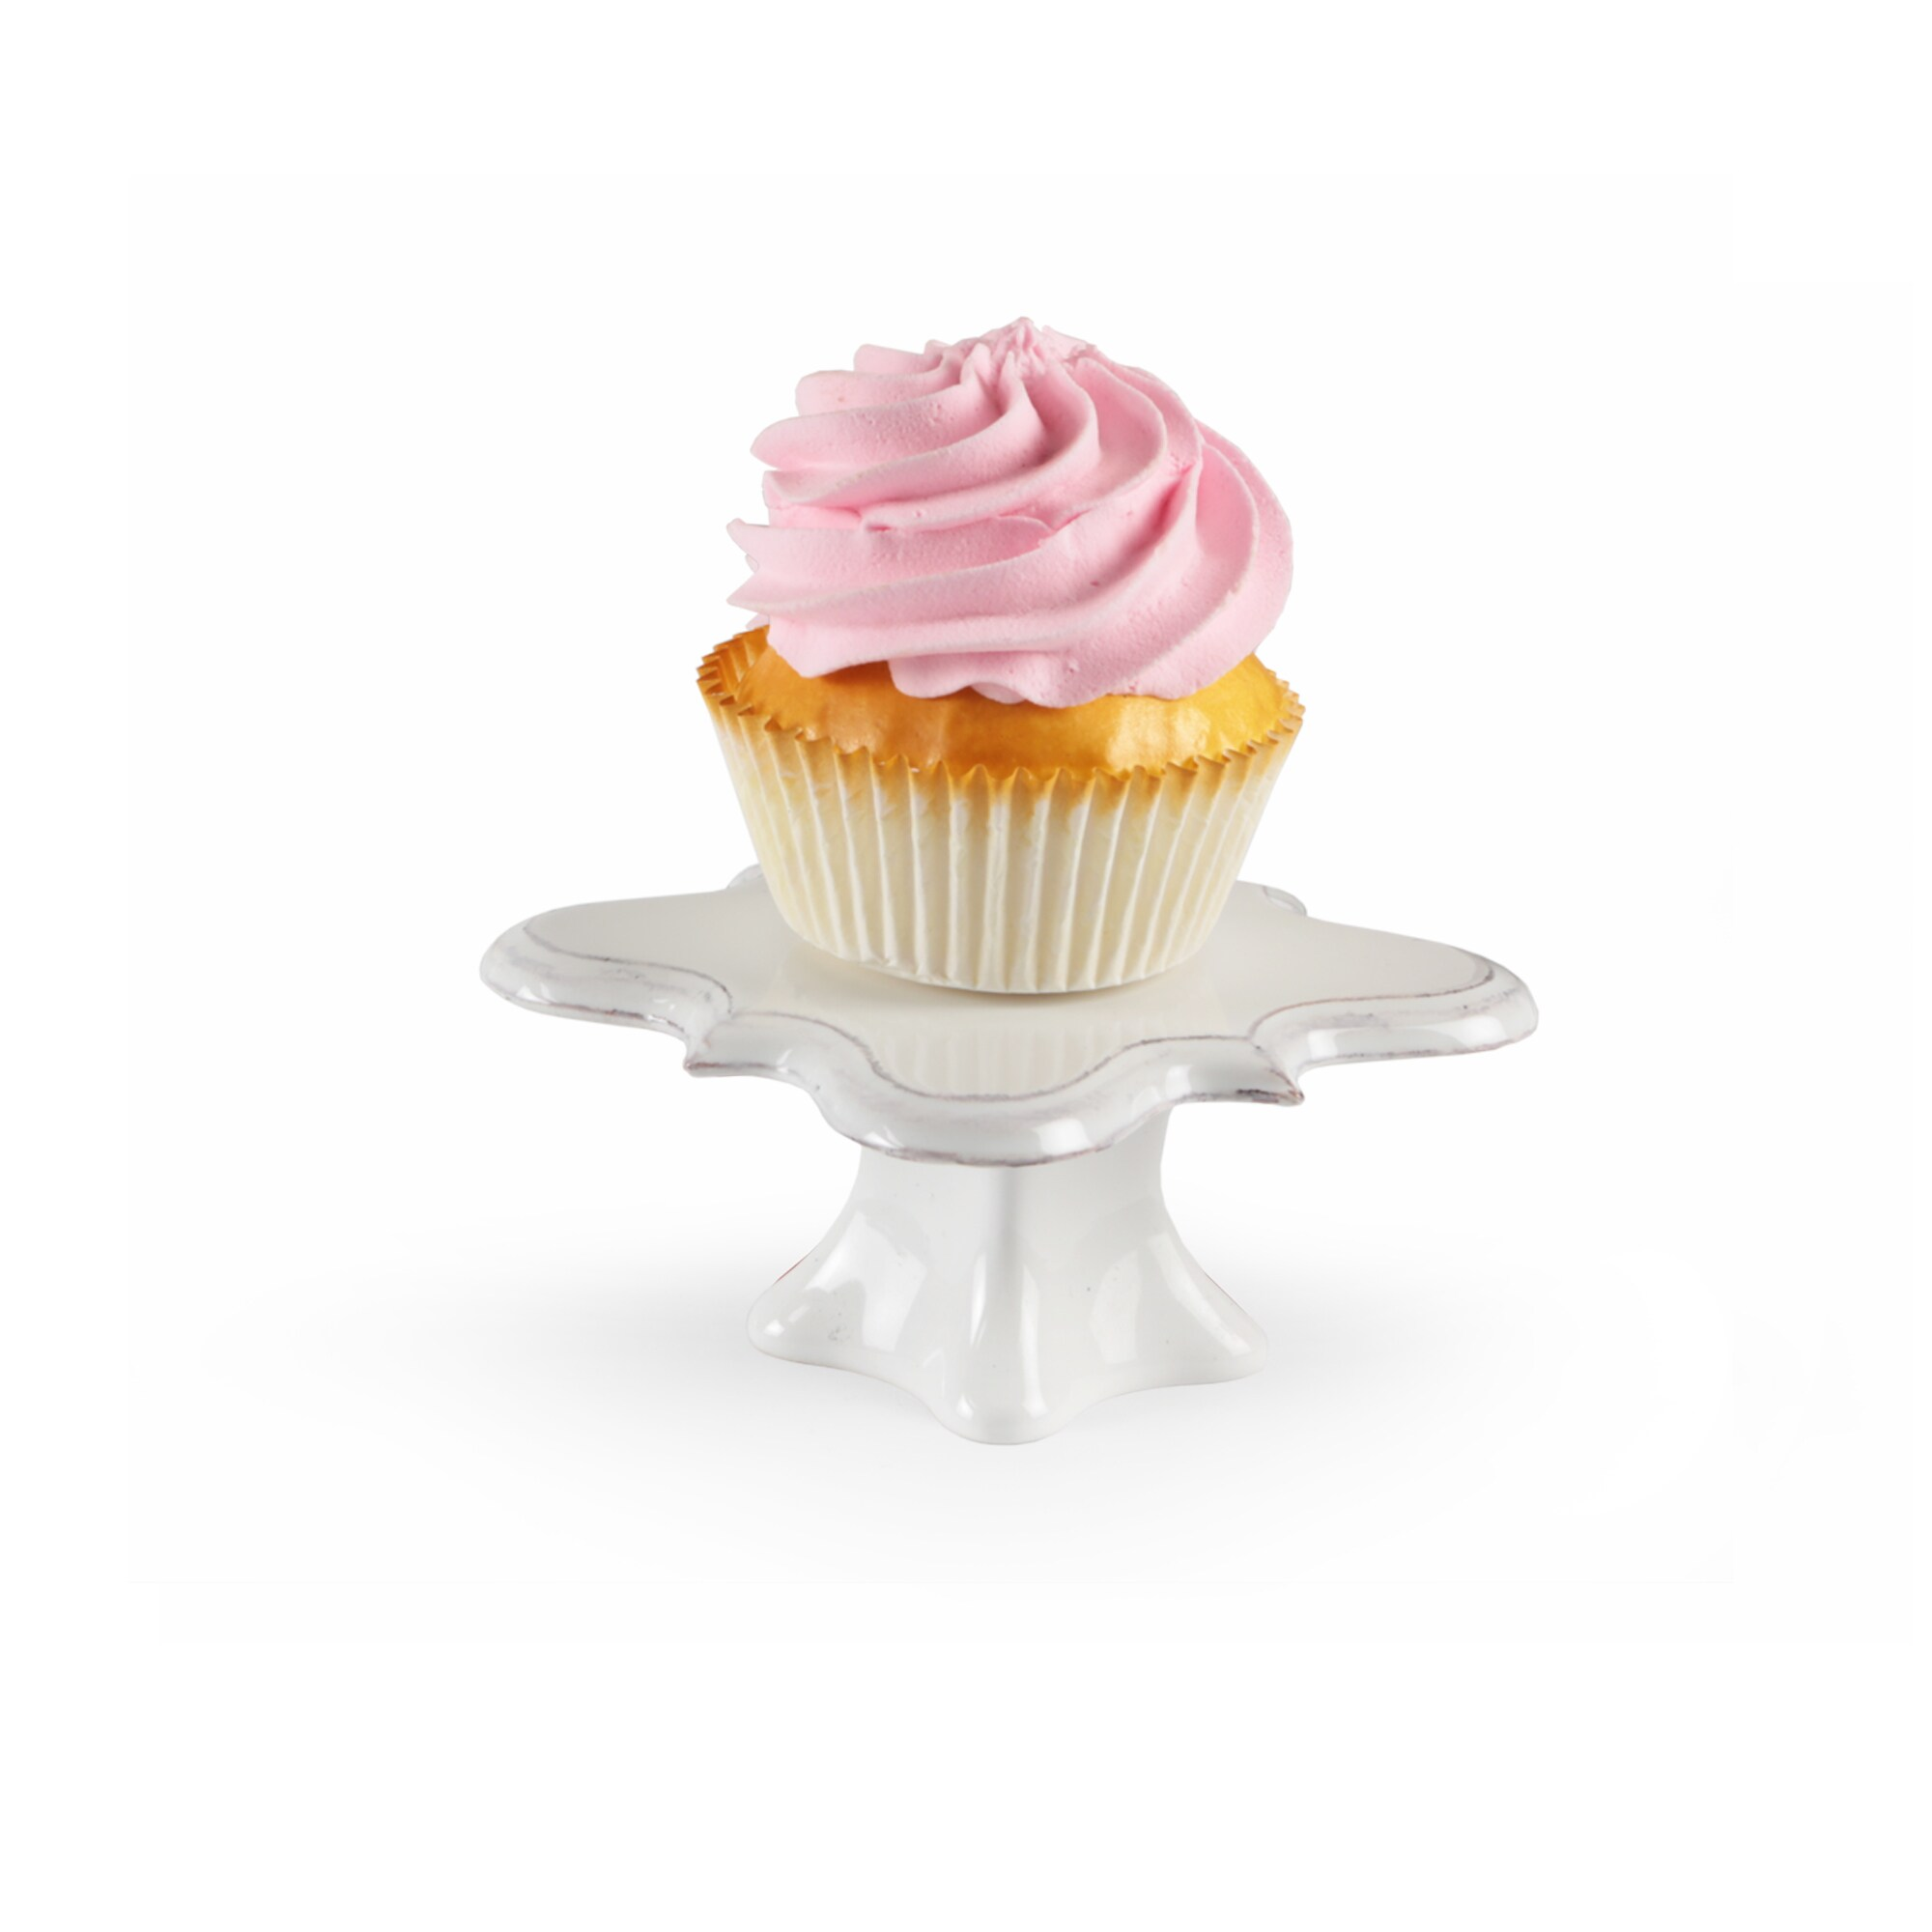 American Atelier Bianca S/4 Cup Cake Pedestal (Bianca Whi...